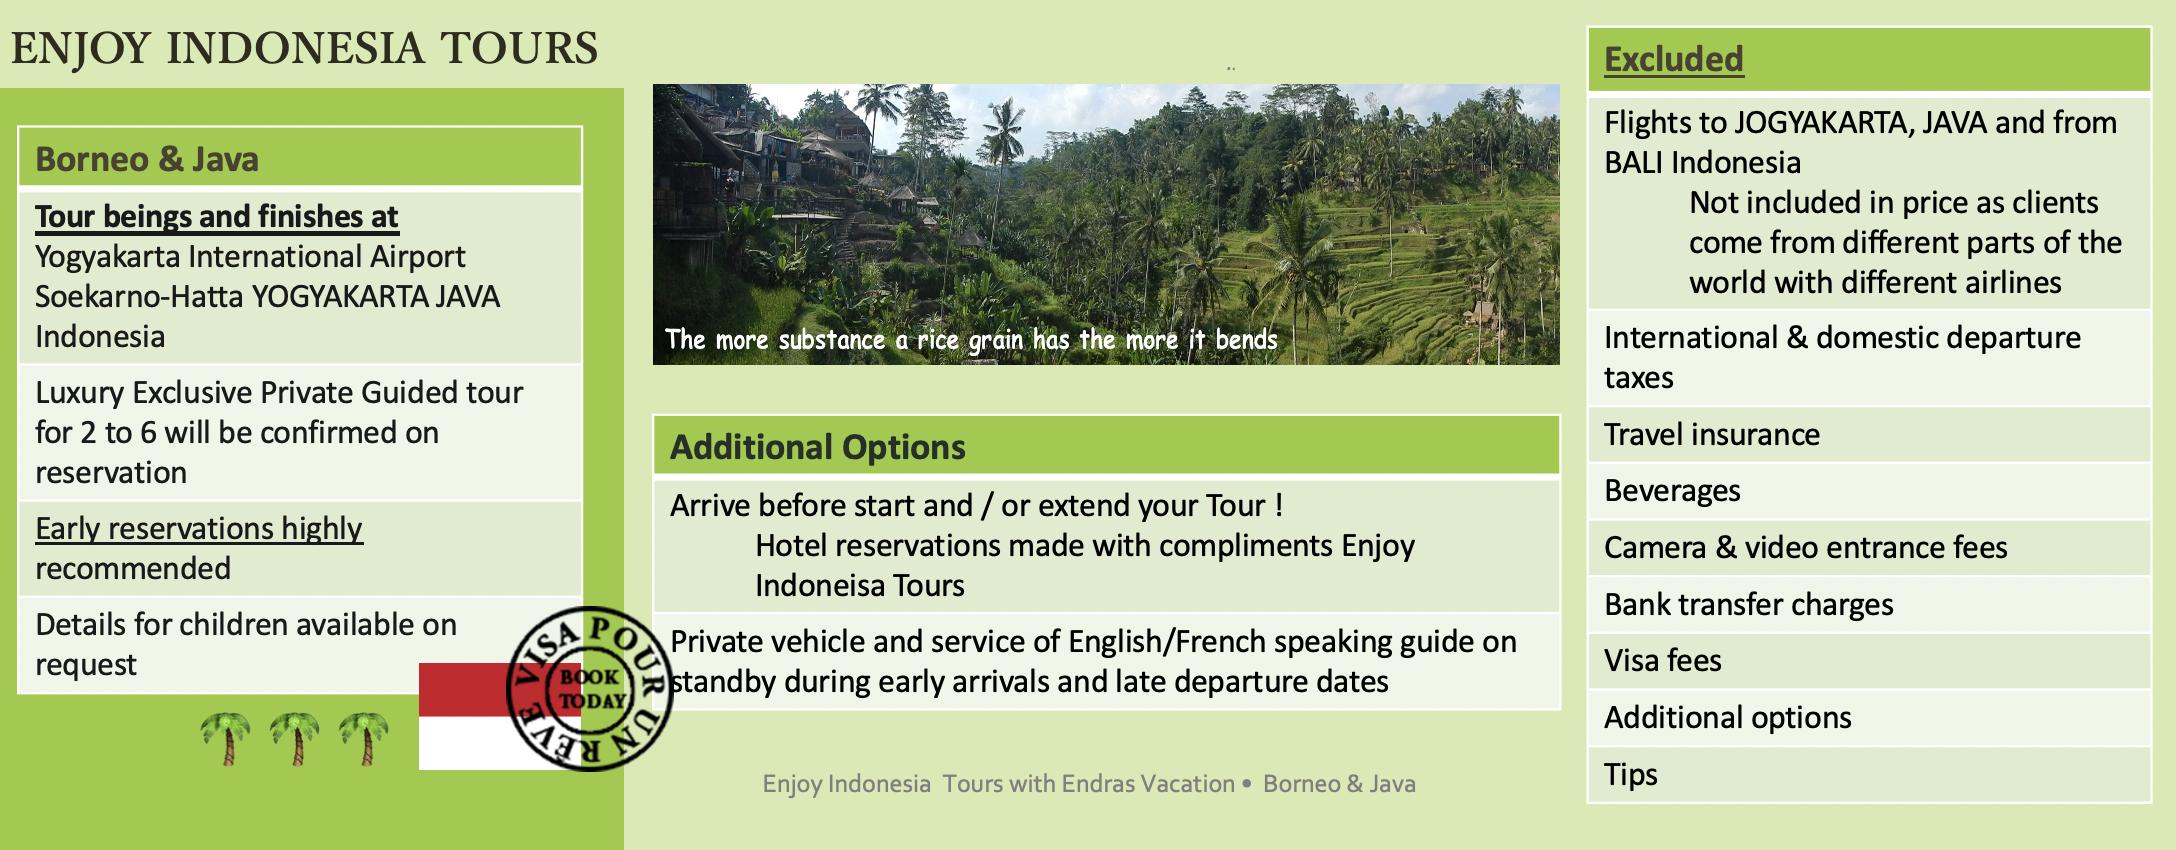 Enjoy Indonesia Tours EV Website Pg 3